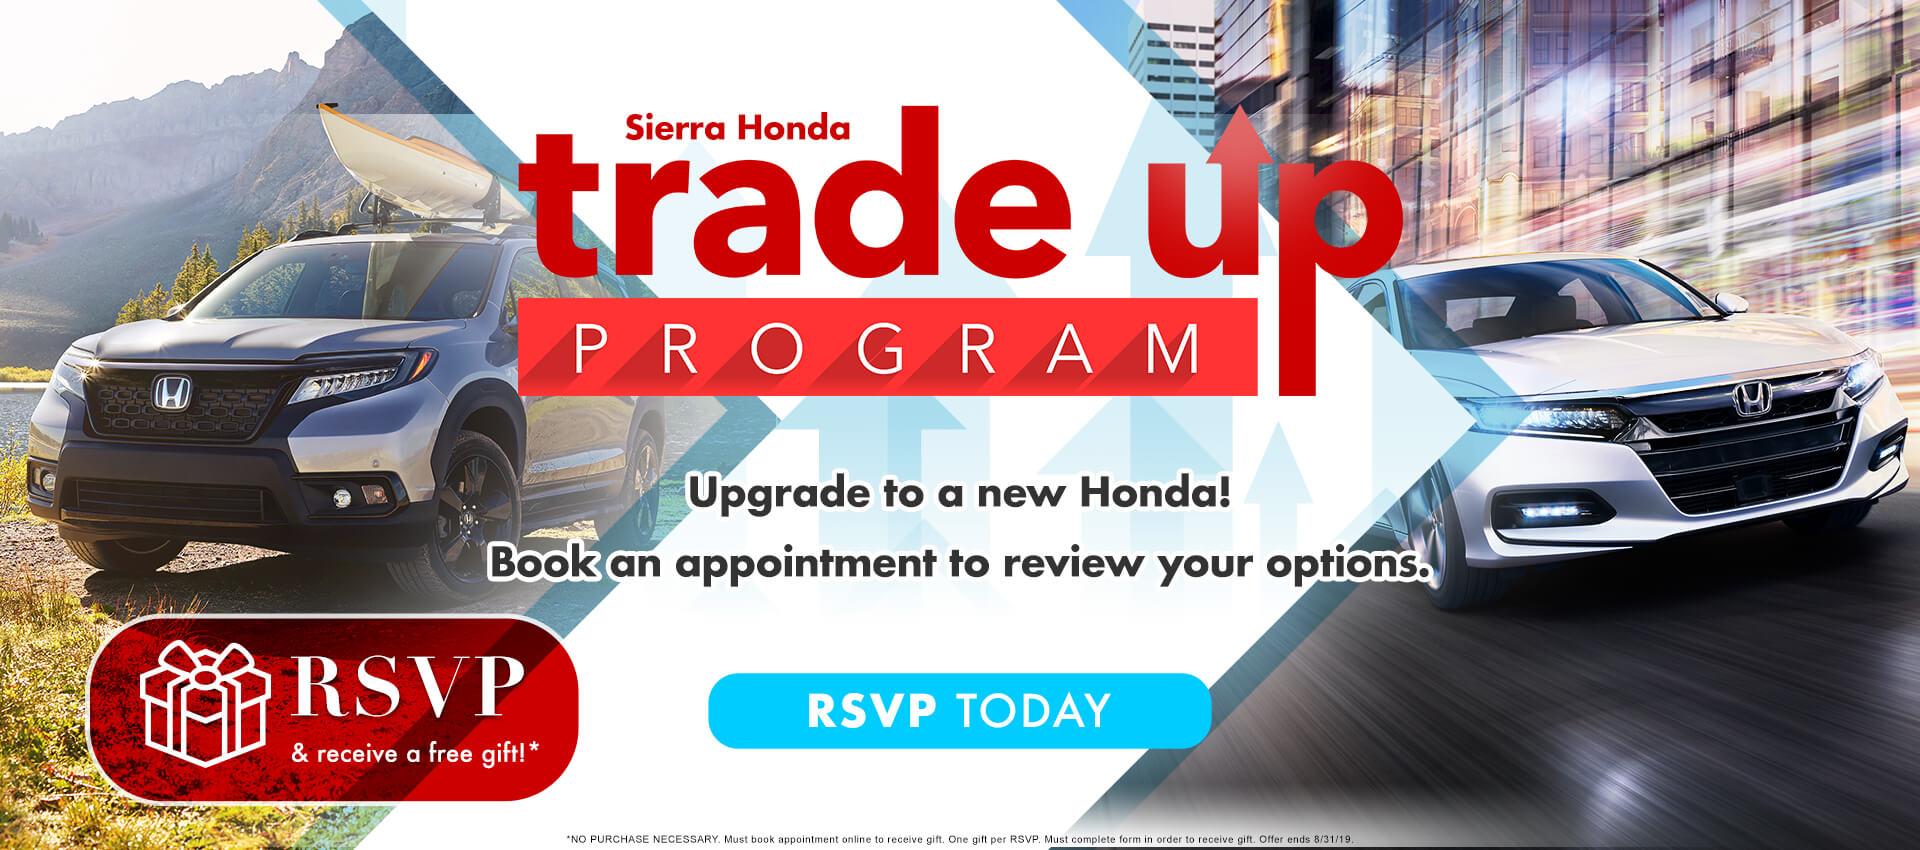 Sierra Honda Trade Up Event